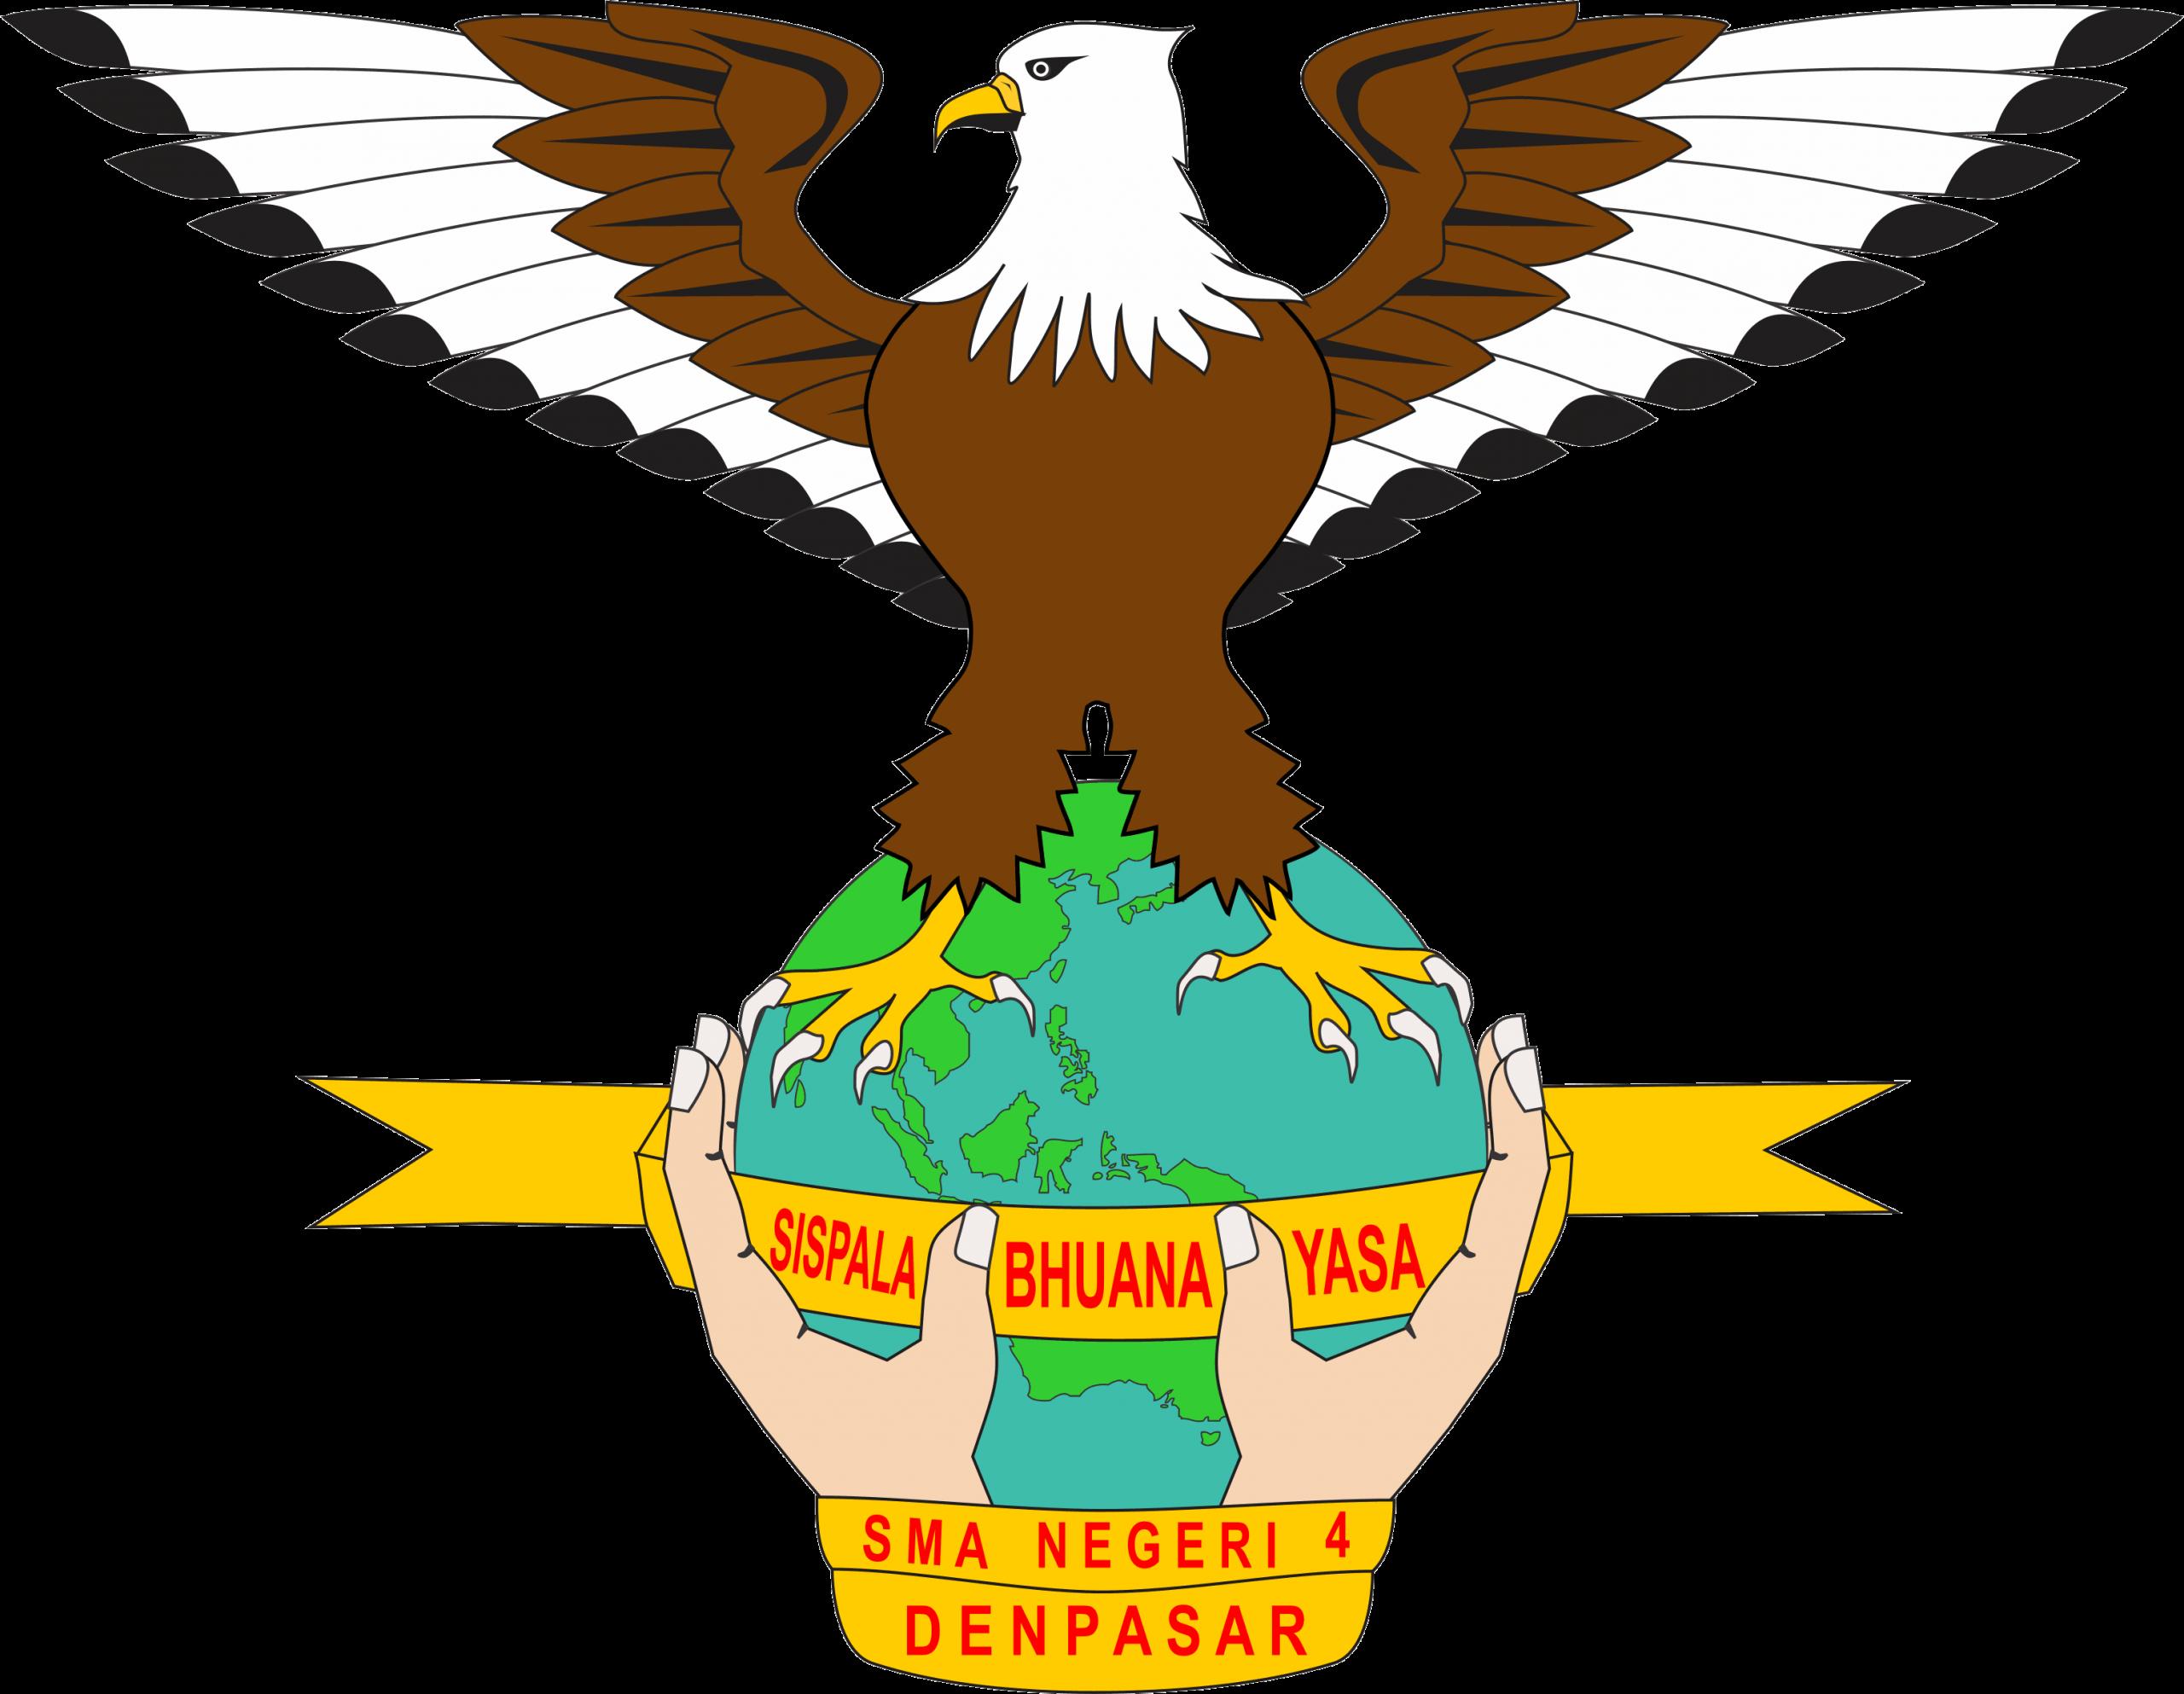 Logo Sispala Bhuana Yasa